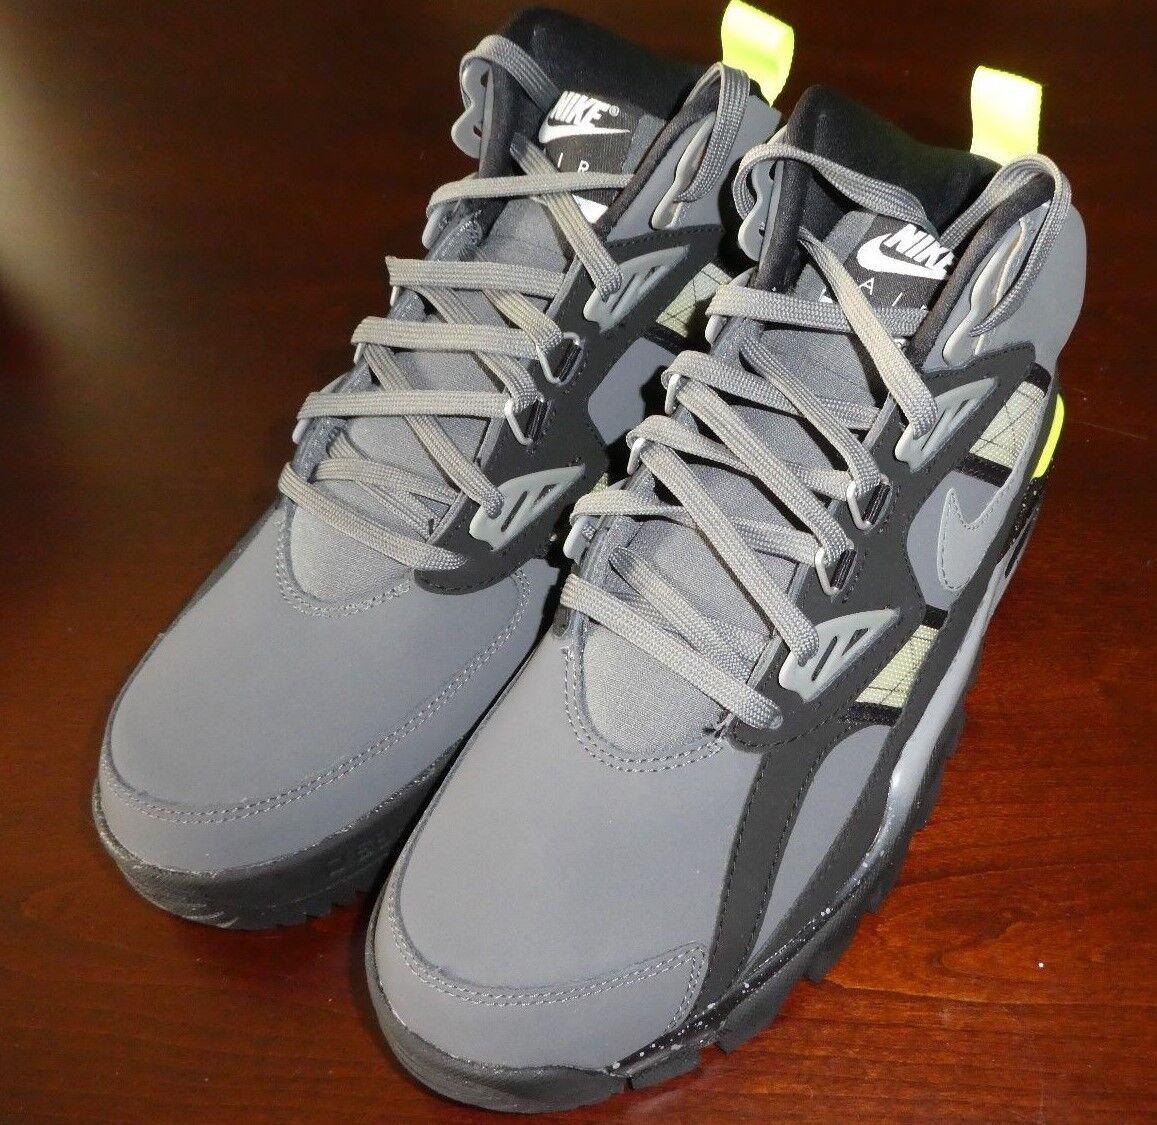 Nike Air Trainer SC Sneakerboot shoes mens new 684713 004